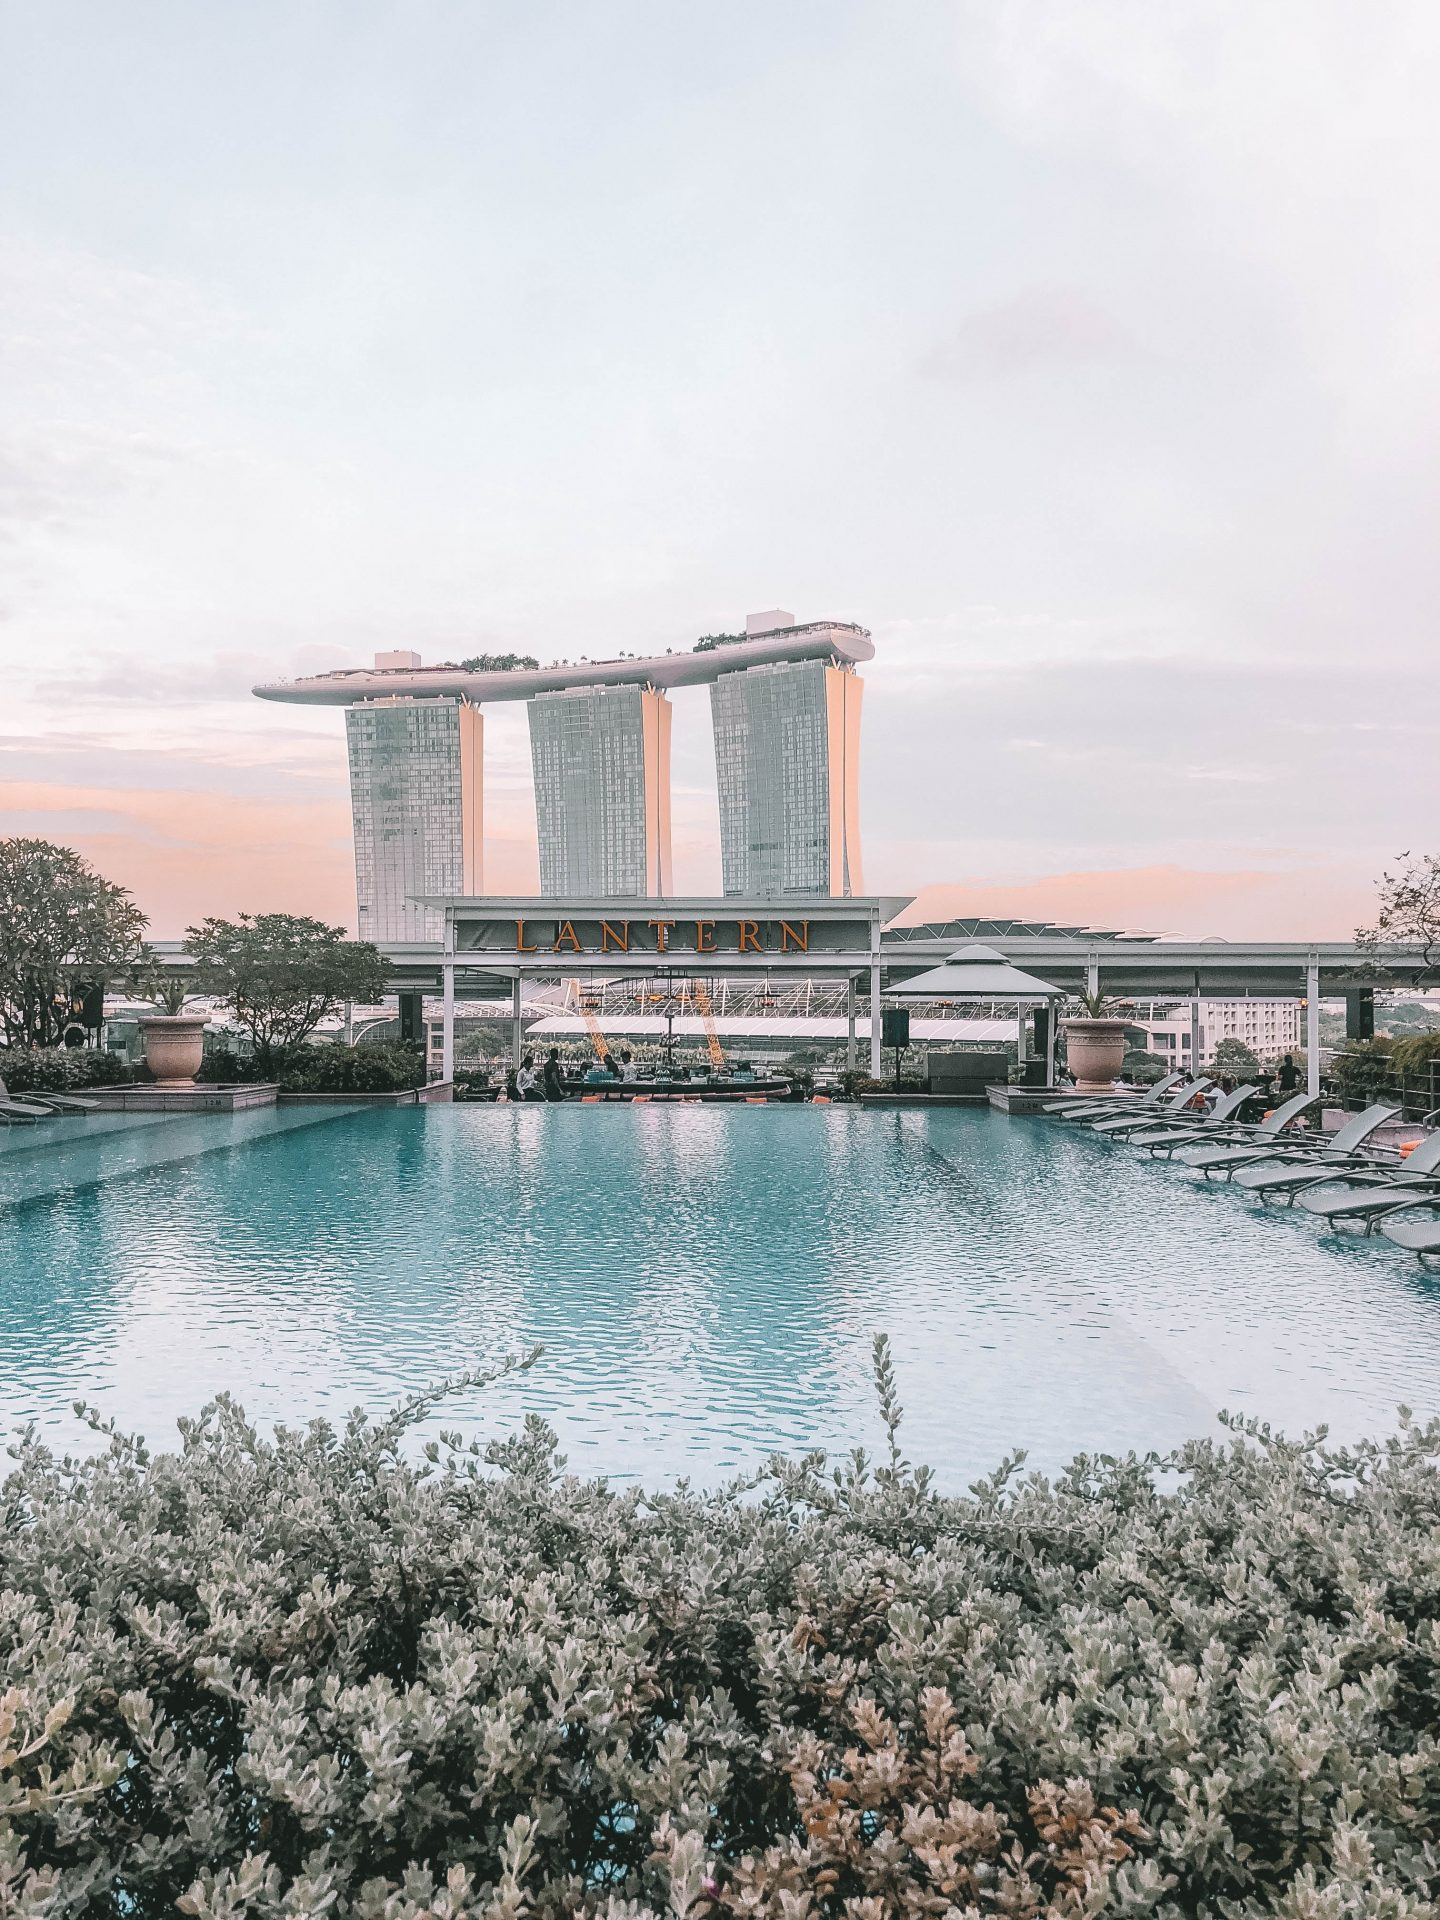 Lantern Bar Singapour - Blondie Baby blog mode Paris et voyages